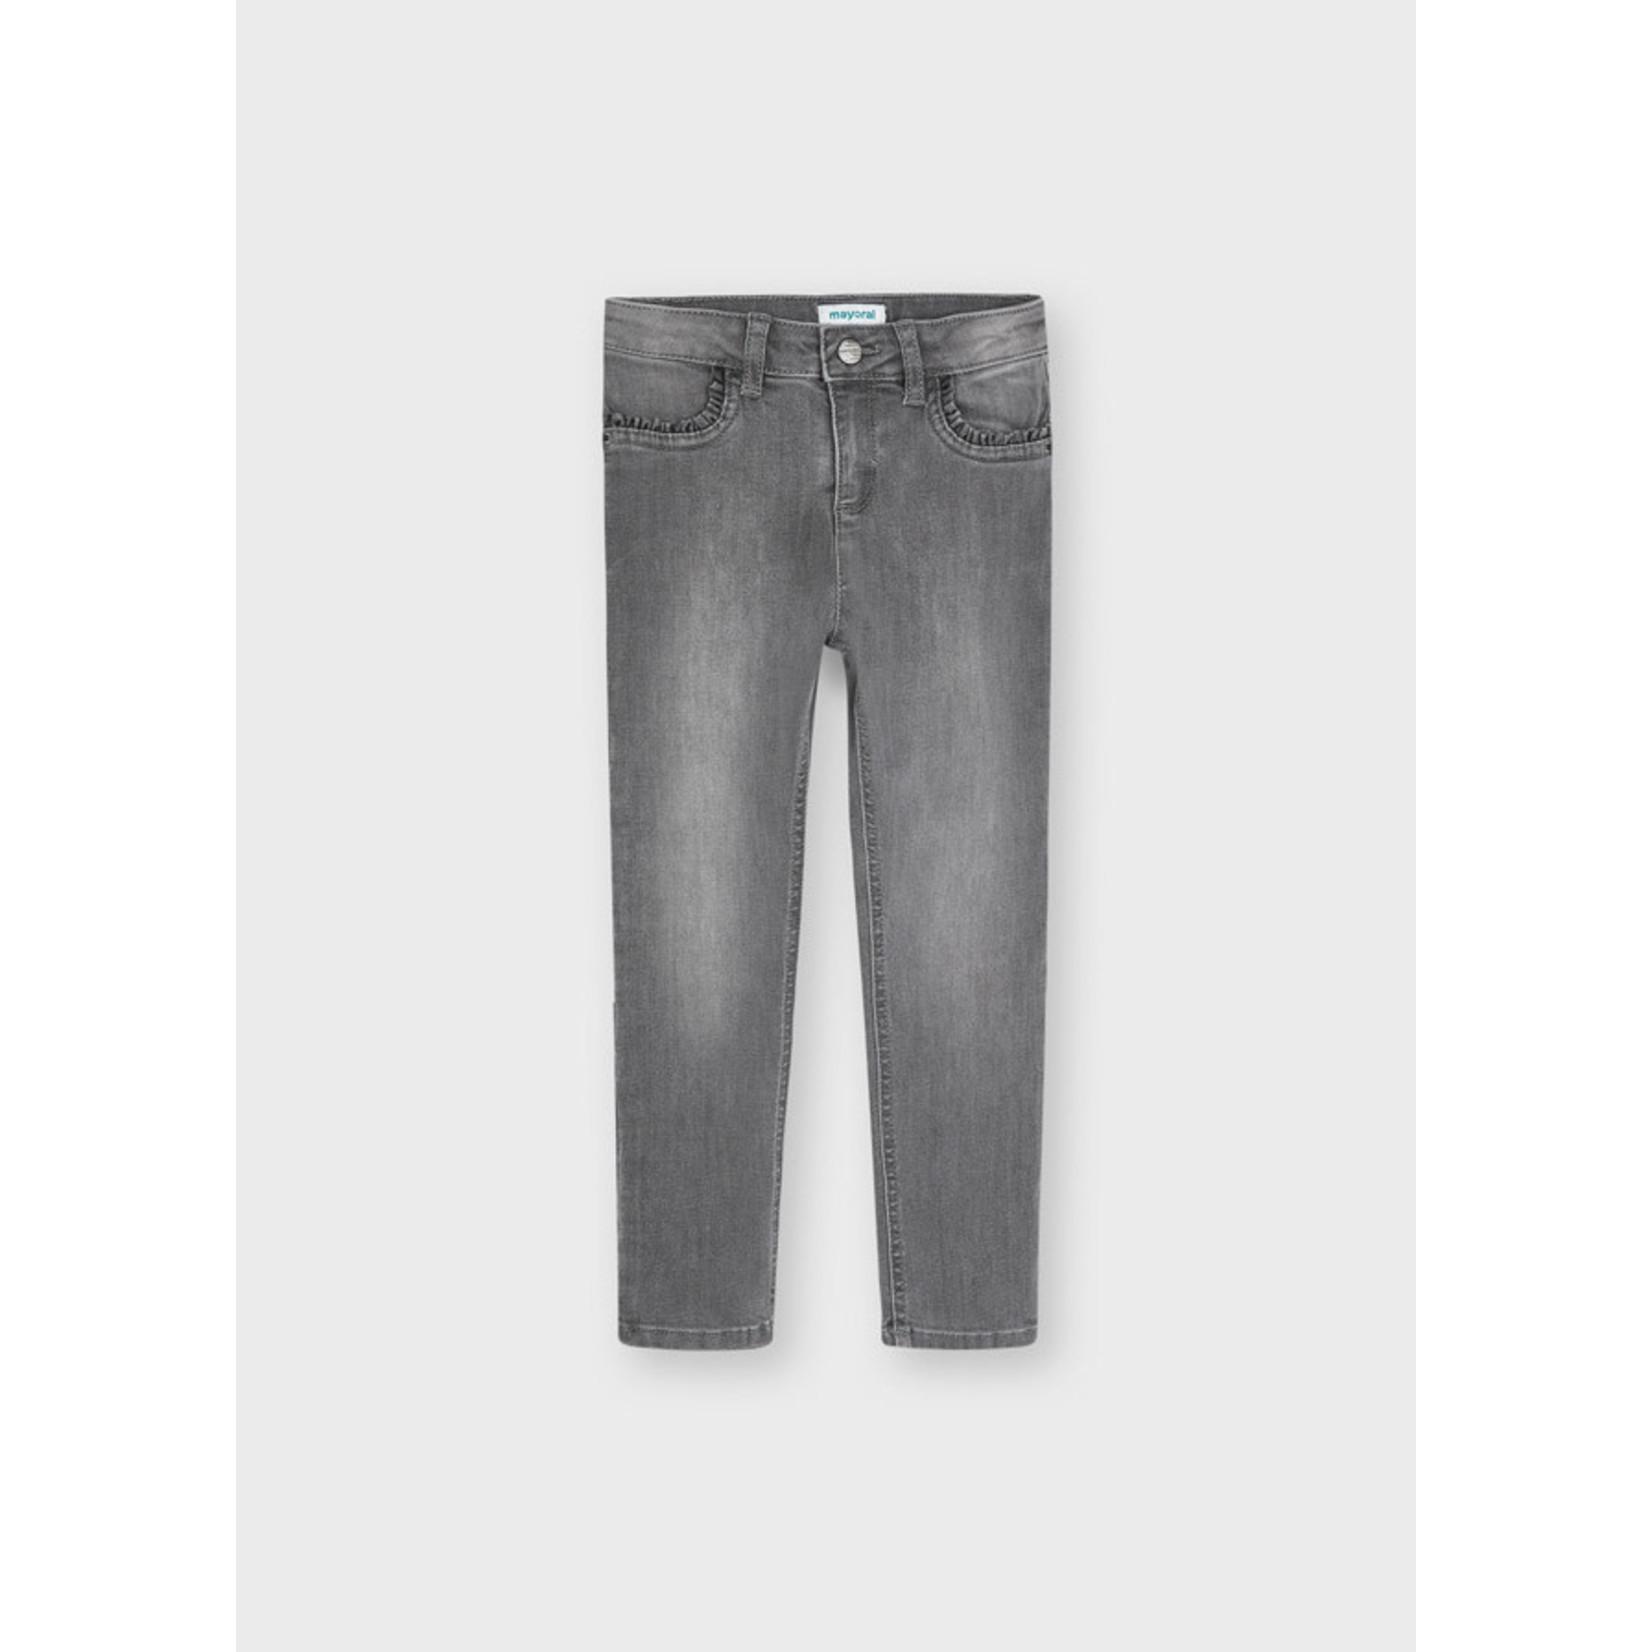 Mayoral Basic Skinny Pants, Light Gray